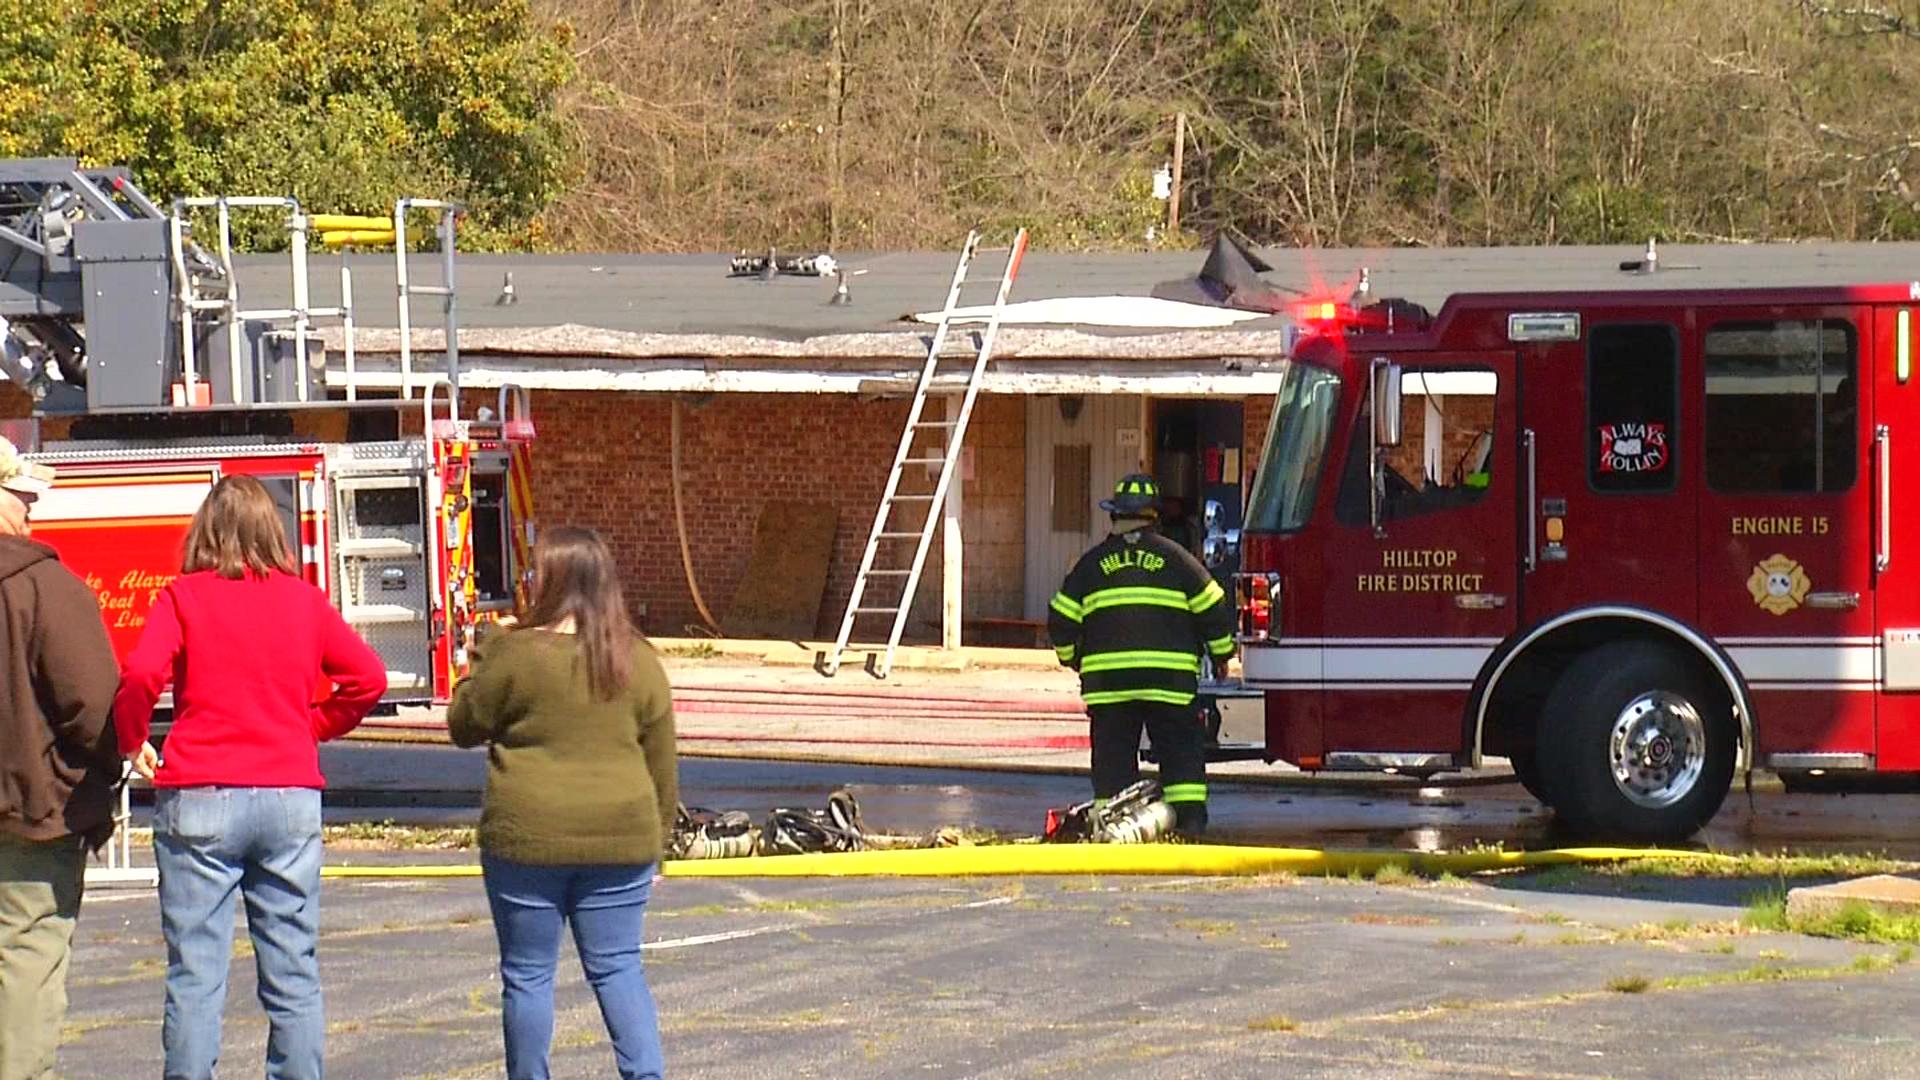 Spartanburg Motor Lodge fire